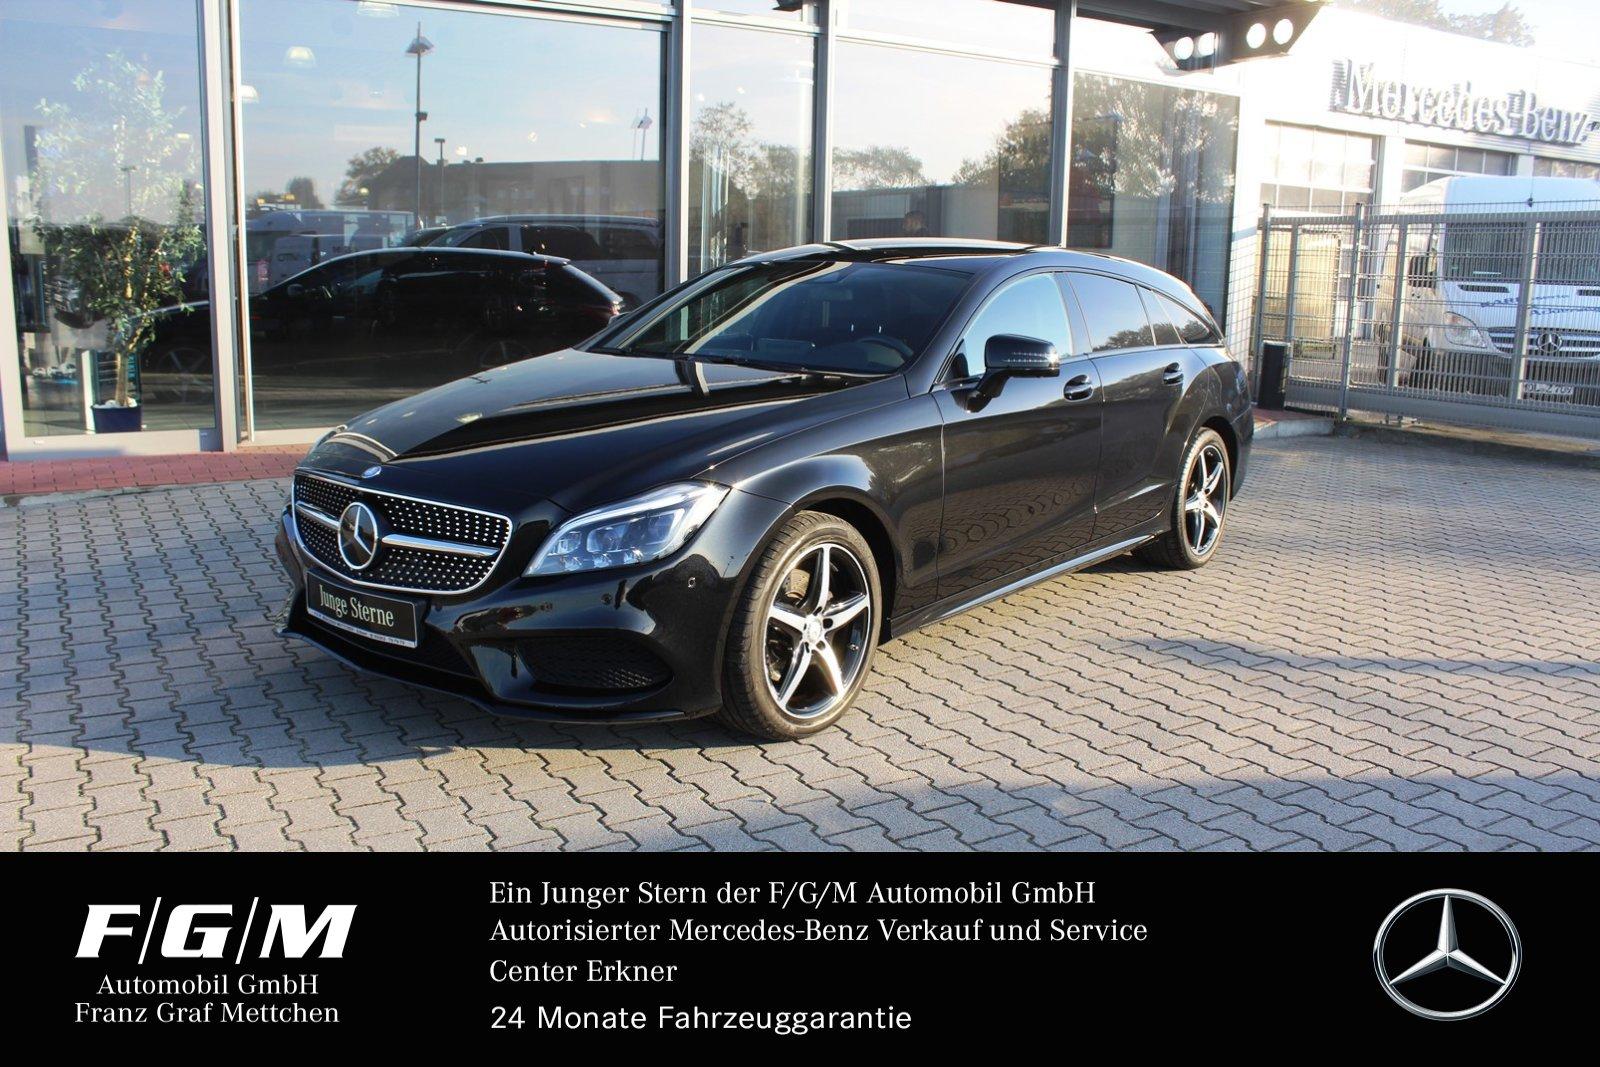 Mercedes-Benz CLS 250 BT 4M SB AMG/Com/ILS/Distr/Airmatic/Nigh, Jahr 2015, Diesel